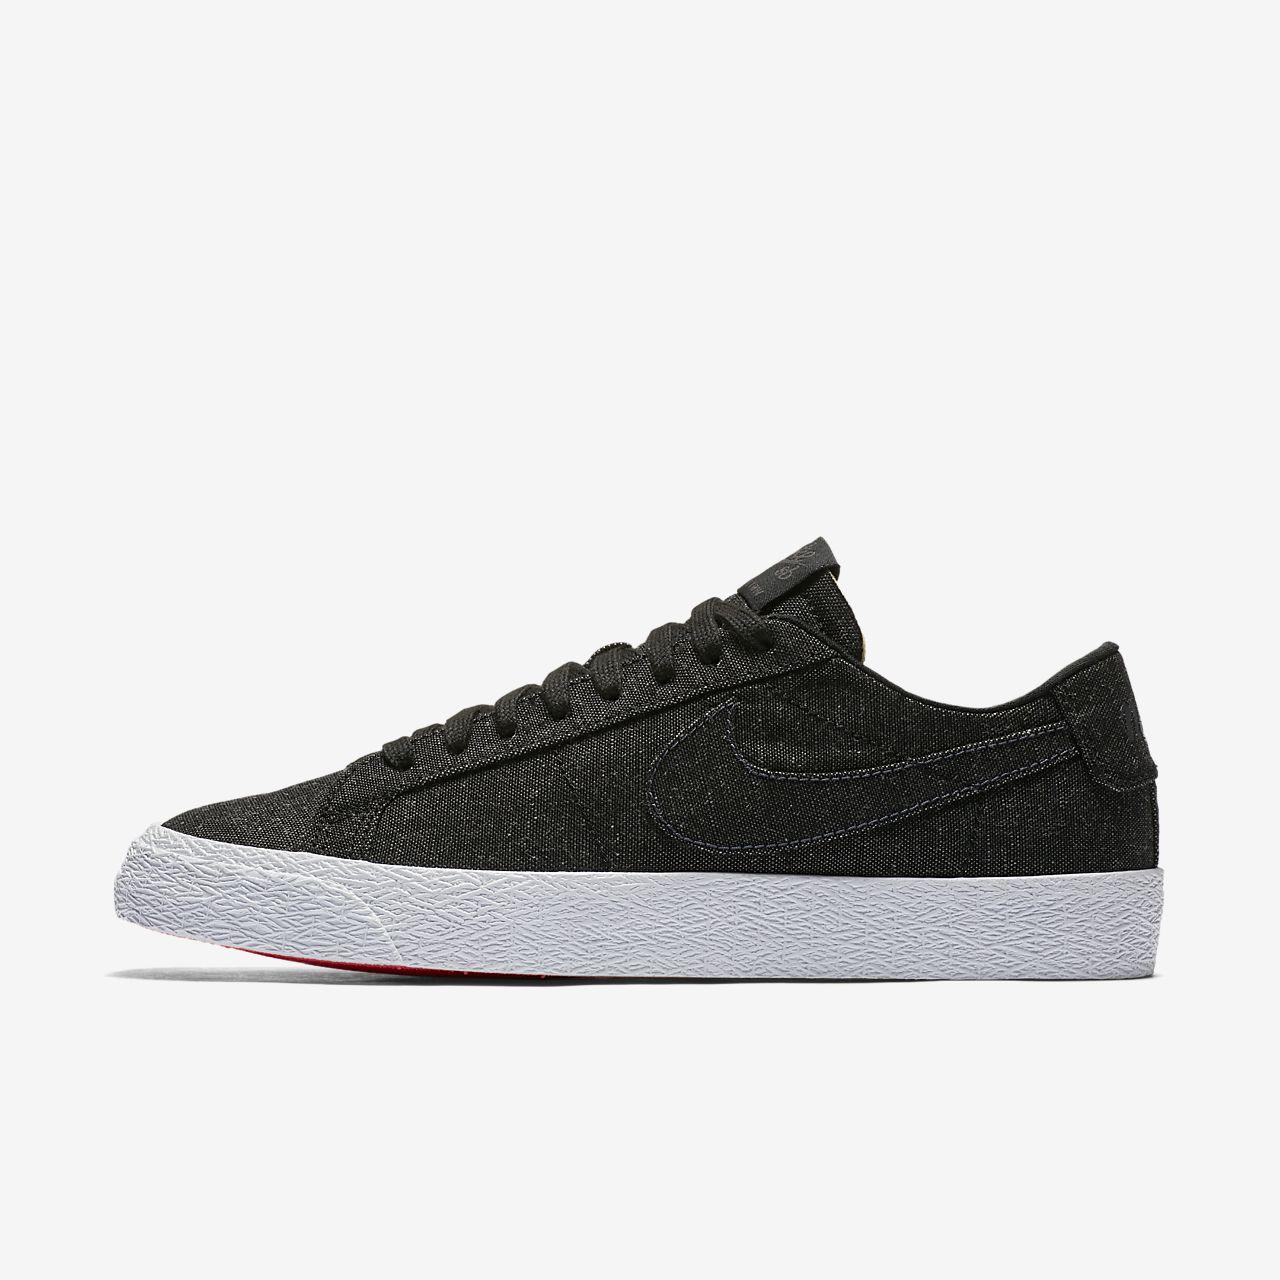 online store 71a19 fb052 ... Chaussure de skateboard Nike SB Zoom Blazer Low Canvas Deconstructed pour  Homme